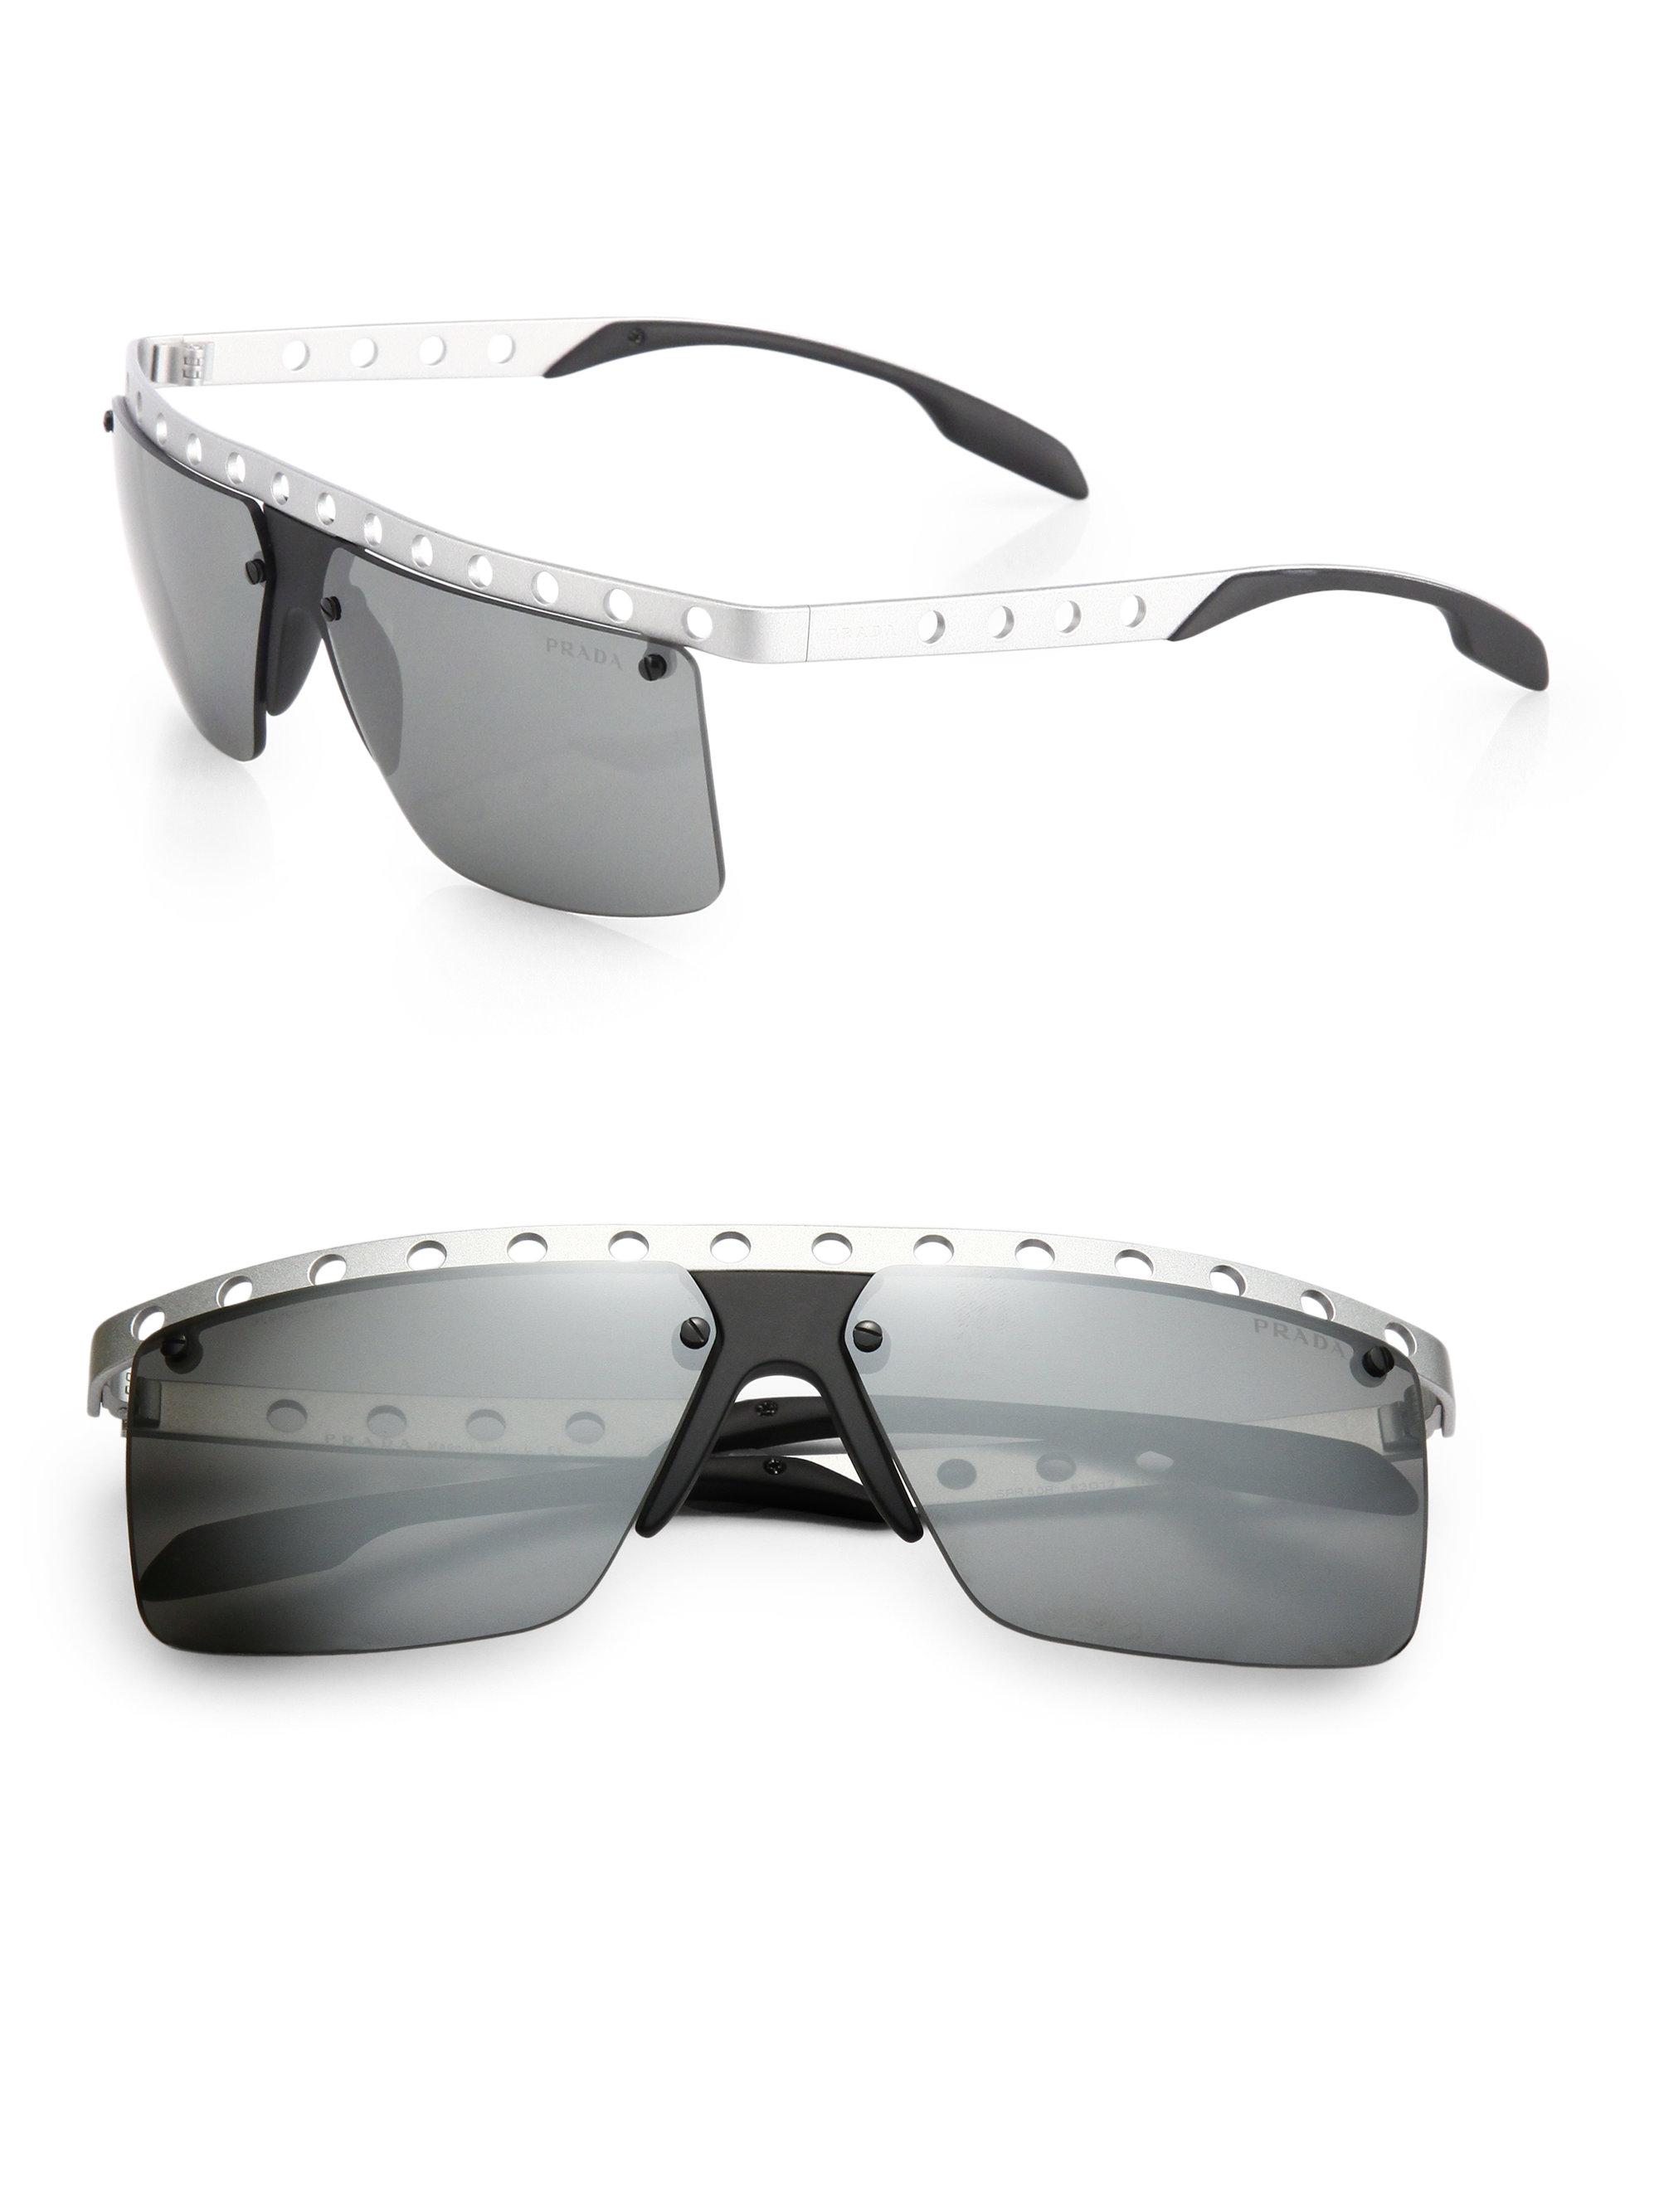 608979054a ... black rectangular aviator sunglasses mens accessories 9f548 7d0ff   cheap lyst prada 62mm perforated metal rimless rectangle sunglasses in  3f880 bed61